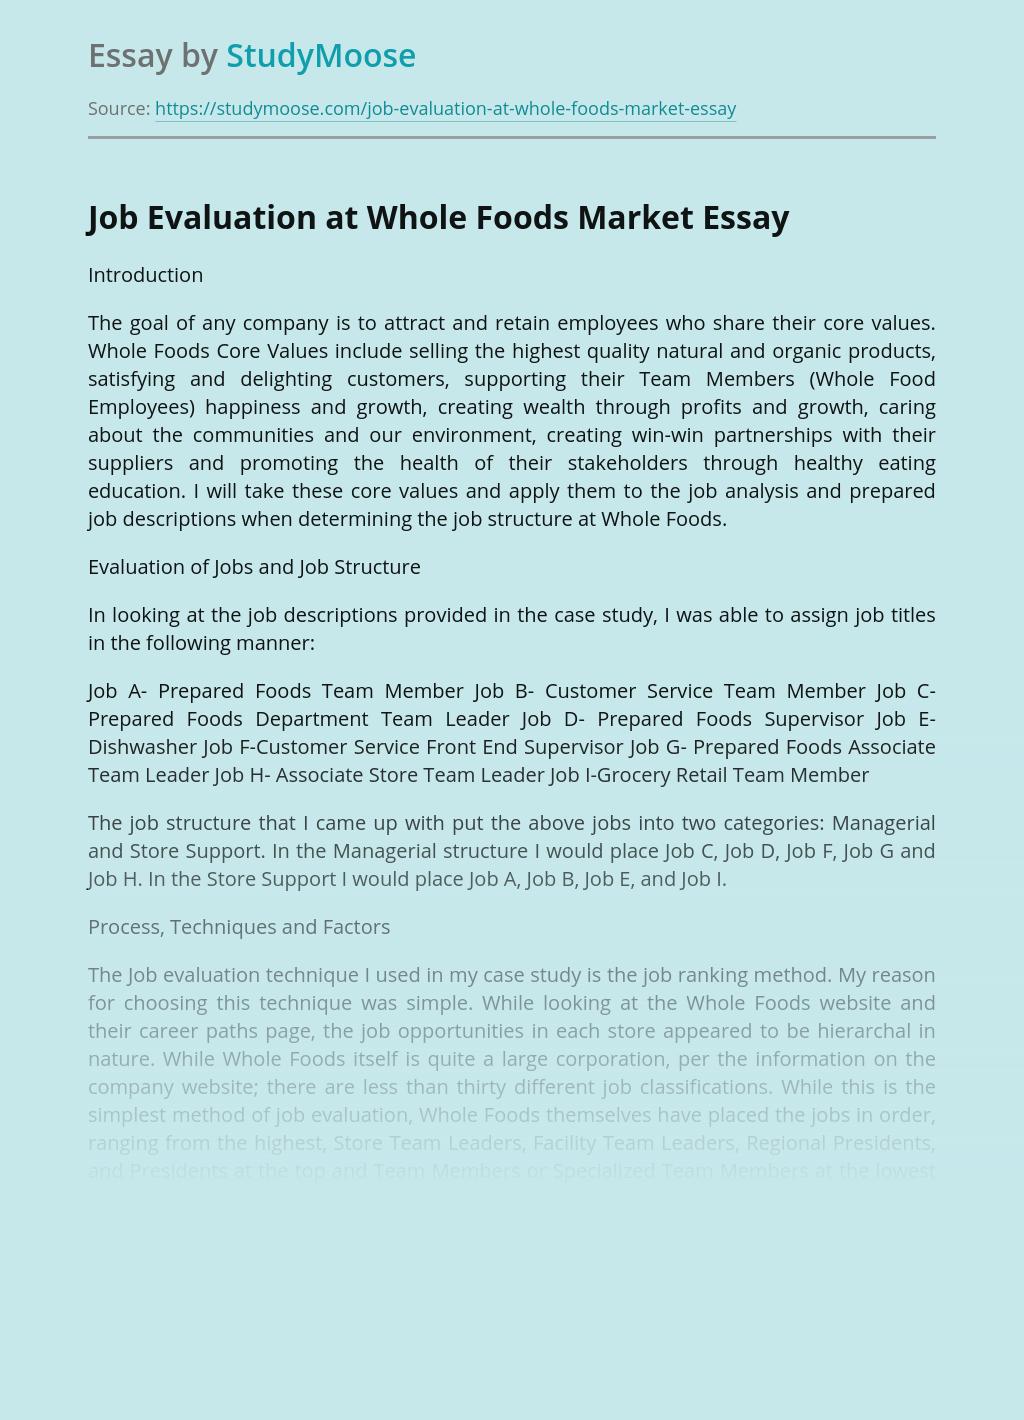 Job Evaluation at Whole Foods Market